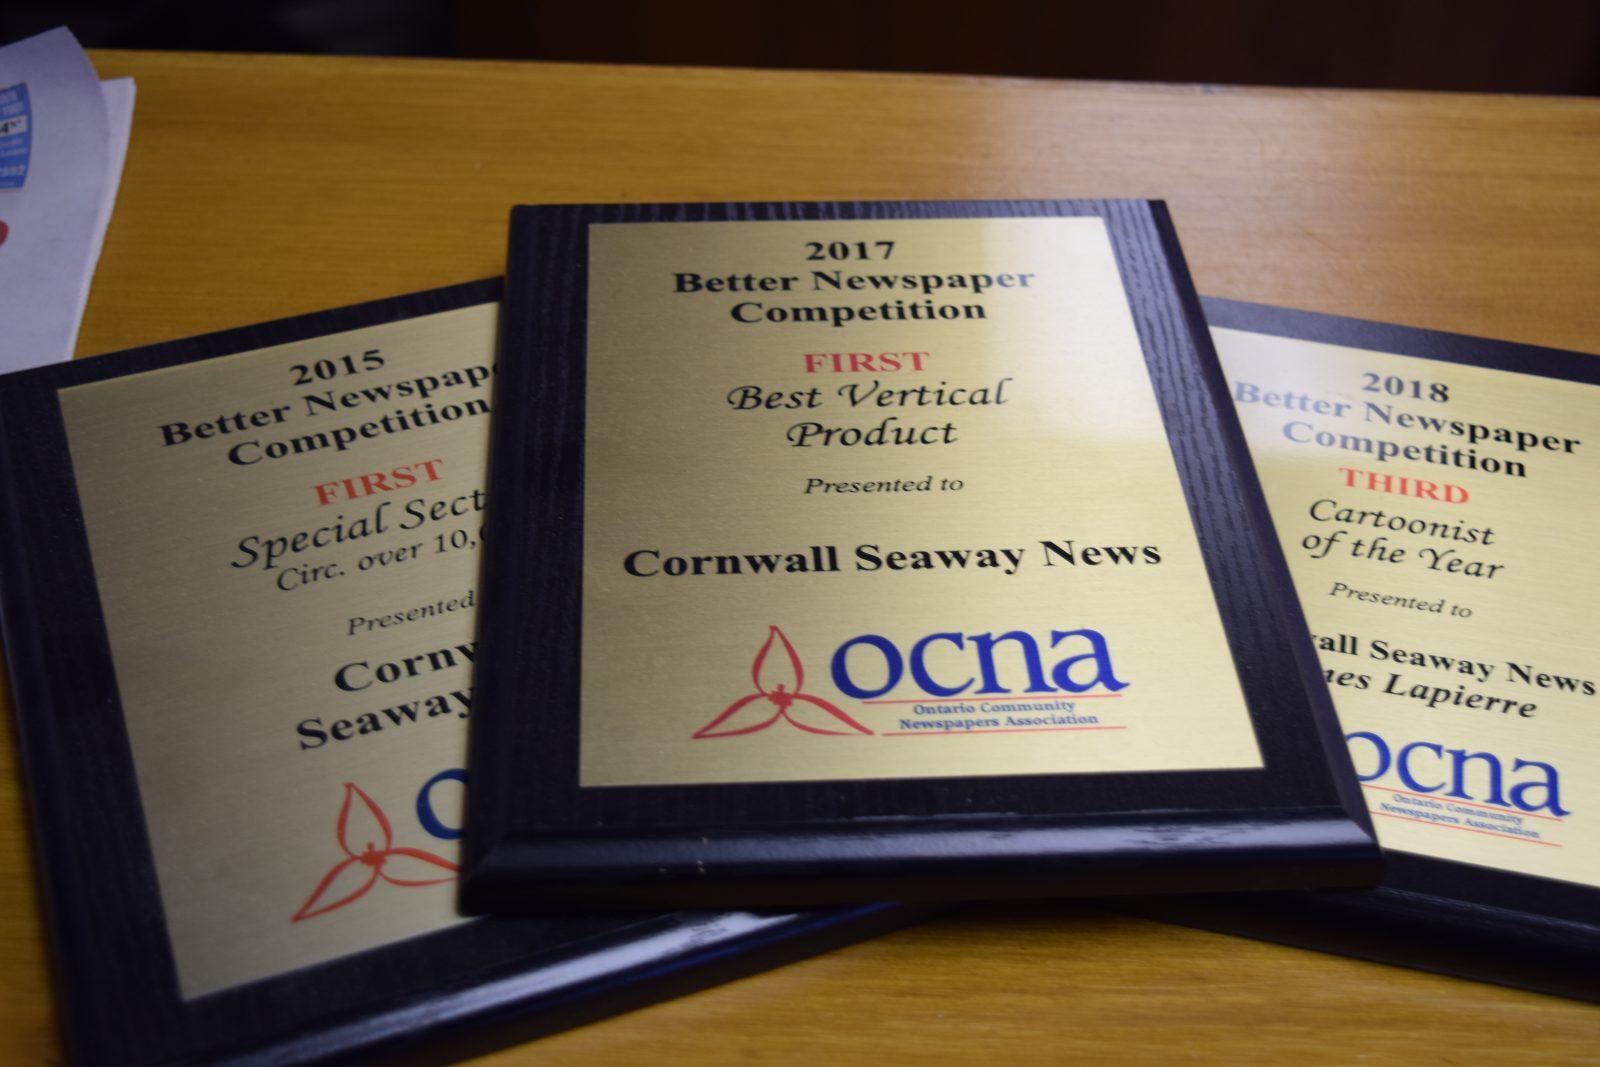 Cornwall Seaway News gets nods for OCNA Awards